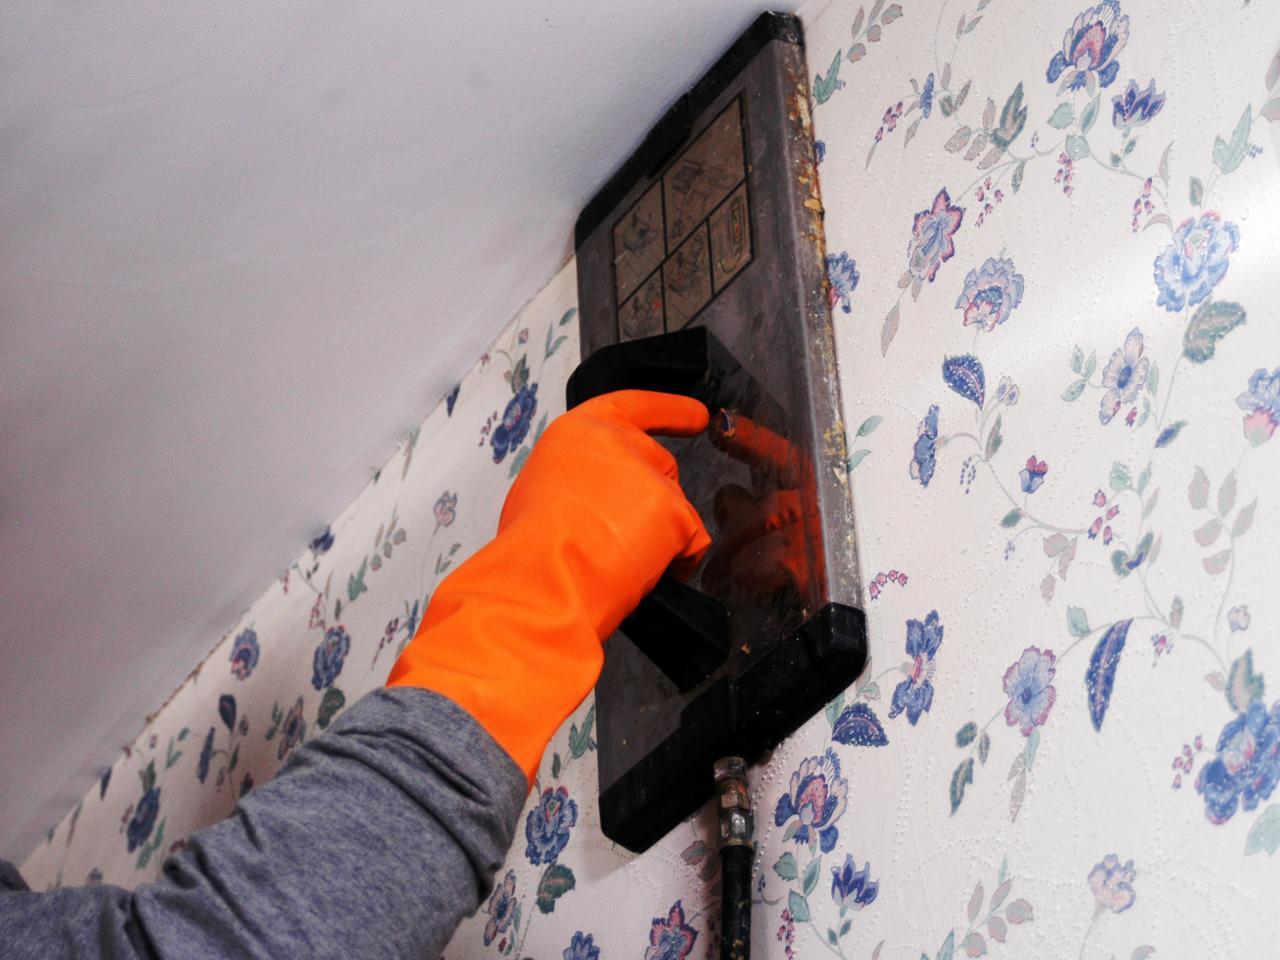 wallpaper removal steamer design ideas